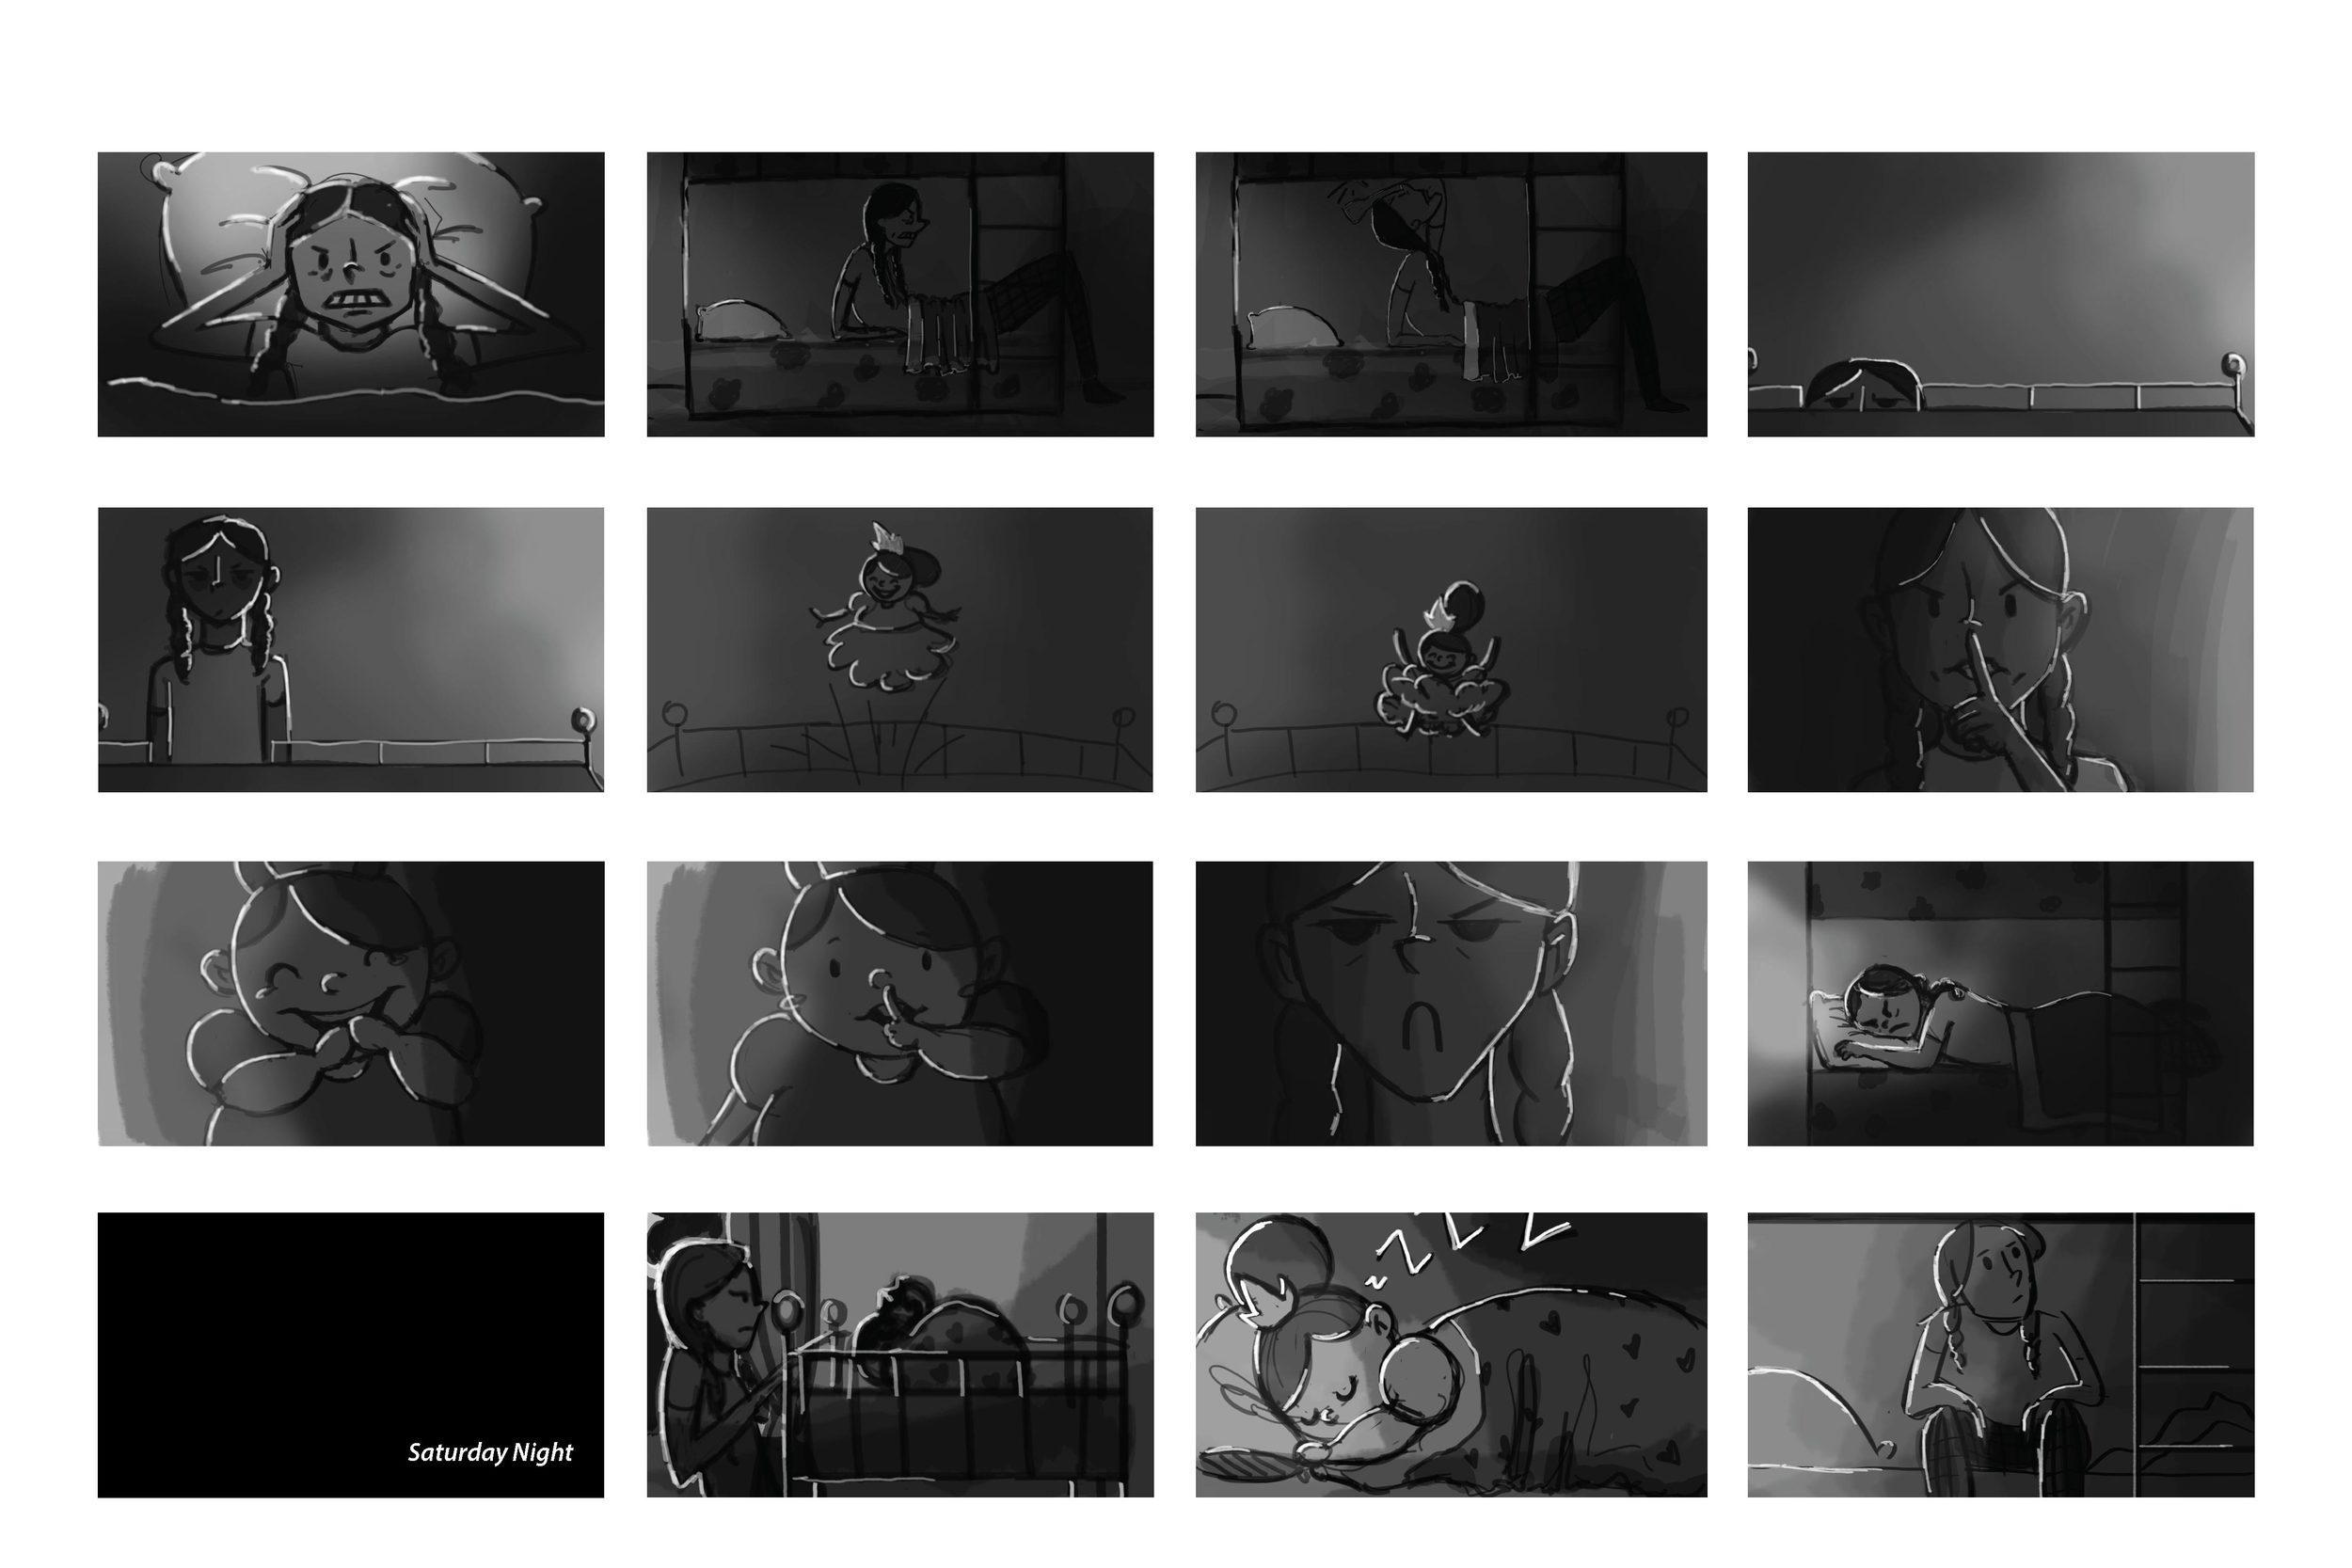 sleepover-page2-01.jpg